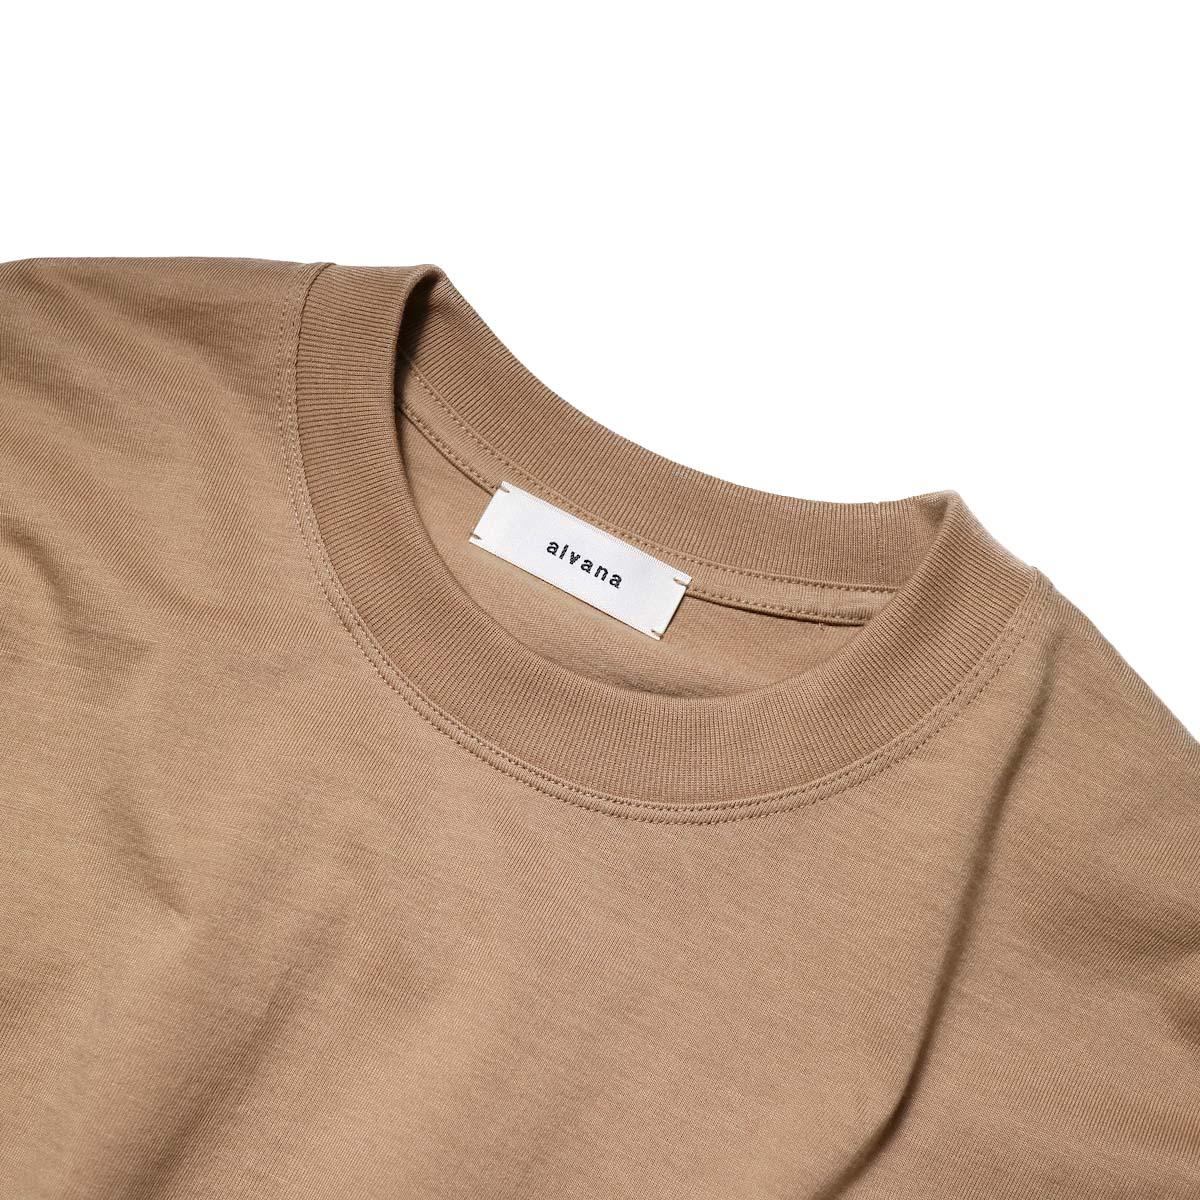 alvana / TANGUIS L/S TEE SHIRTS (Light Brown)クルーネック